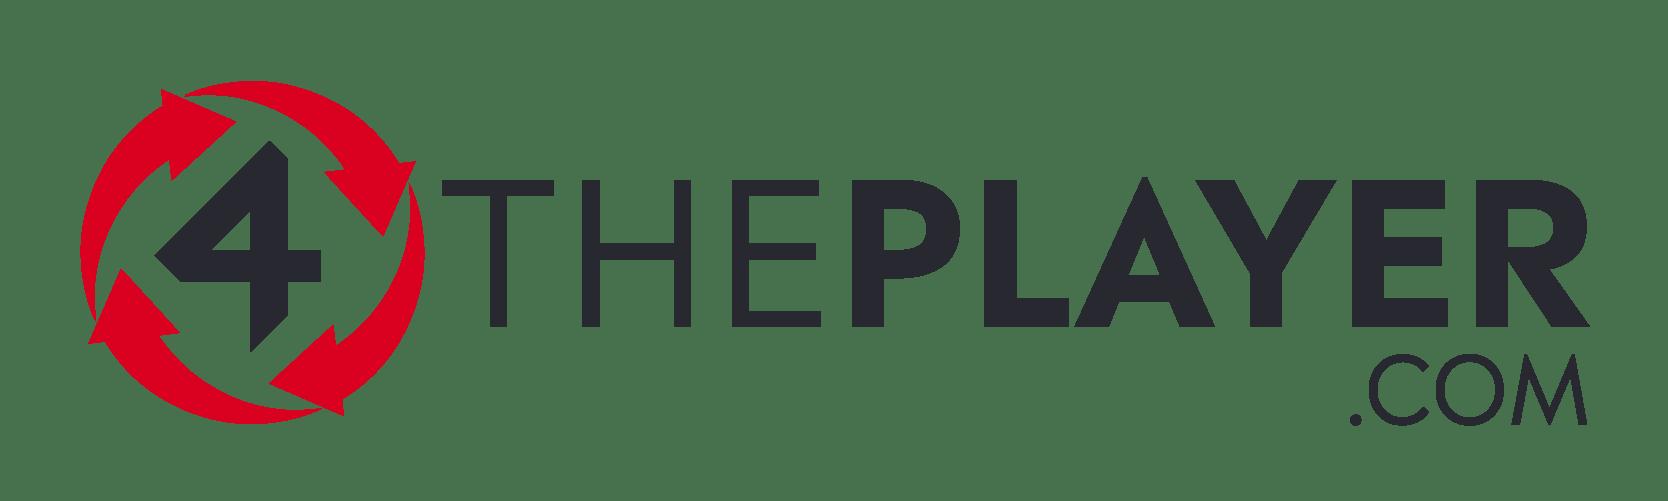 4ThePlayer Spiele